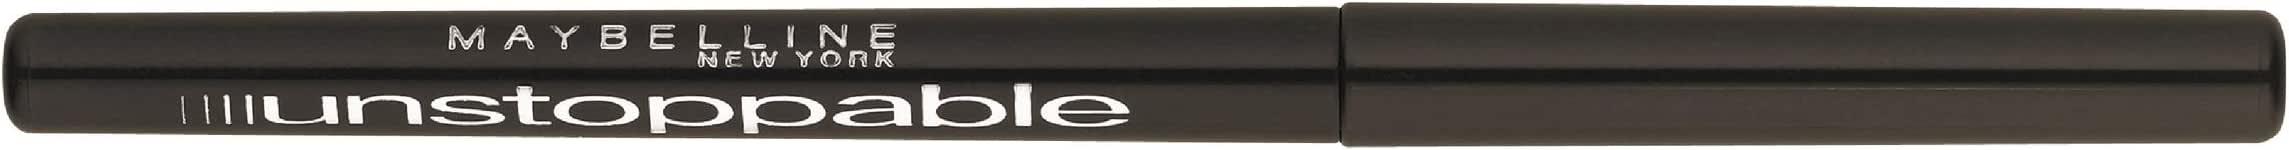 Maybelline Unstoppable Eyeliner Pencil - Espresso